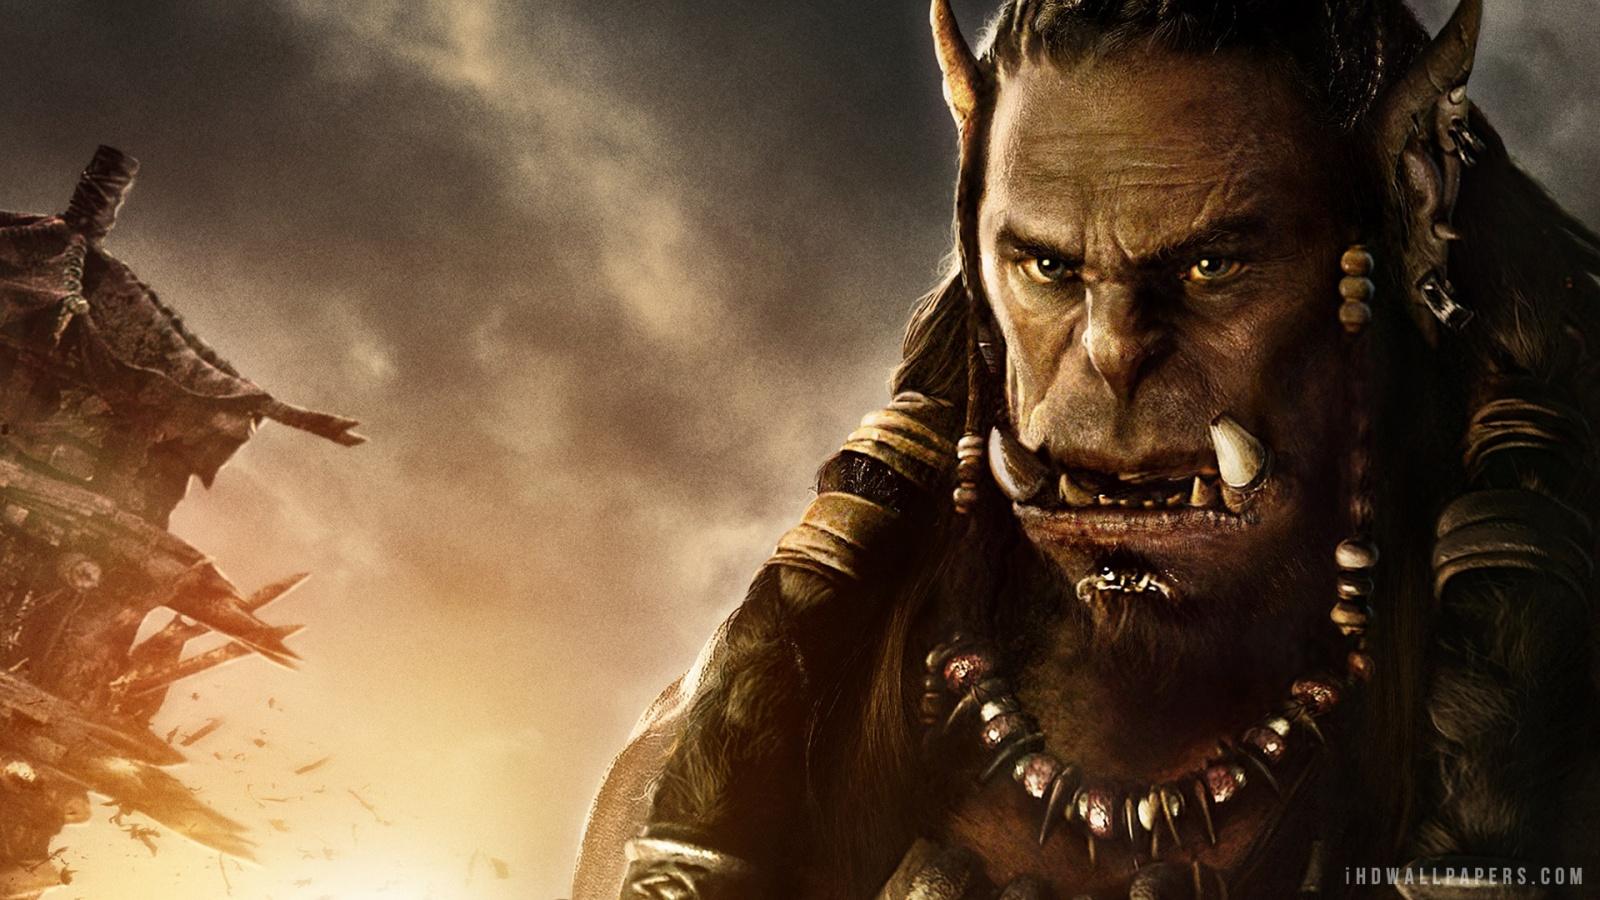 Free Download Warcraft 2016 Movie Hd Wallpaper Ihd